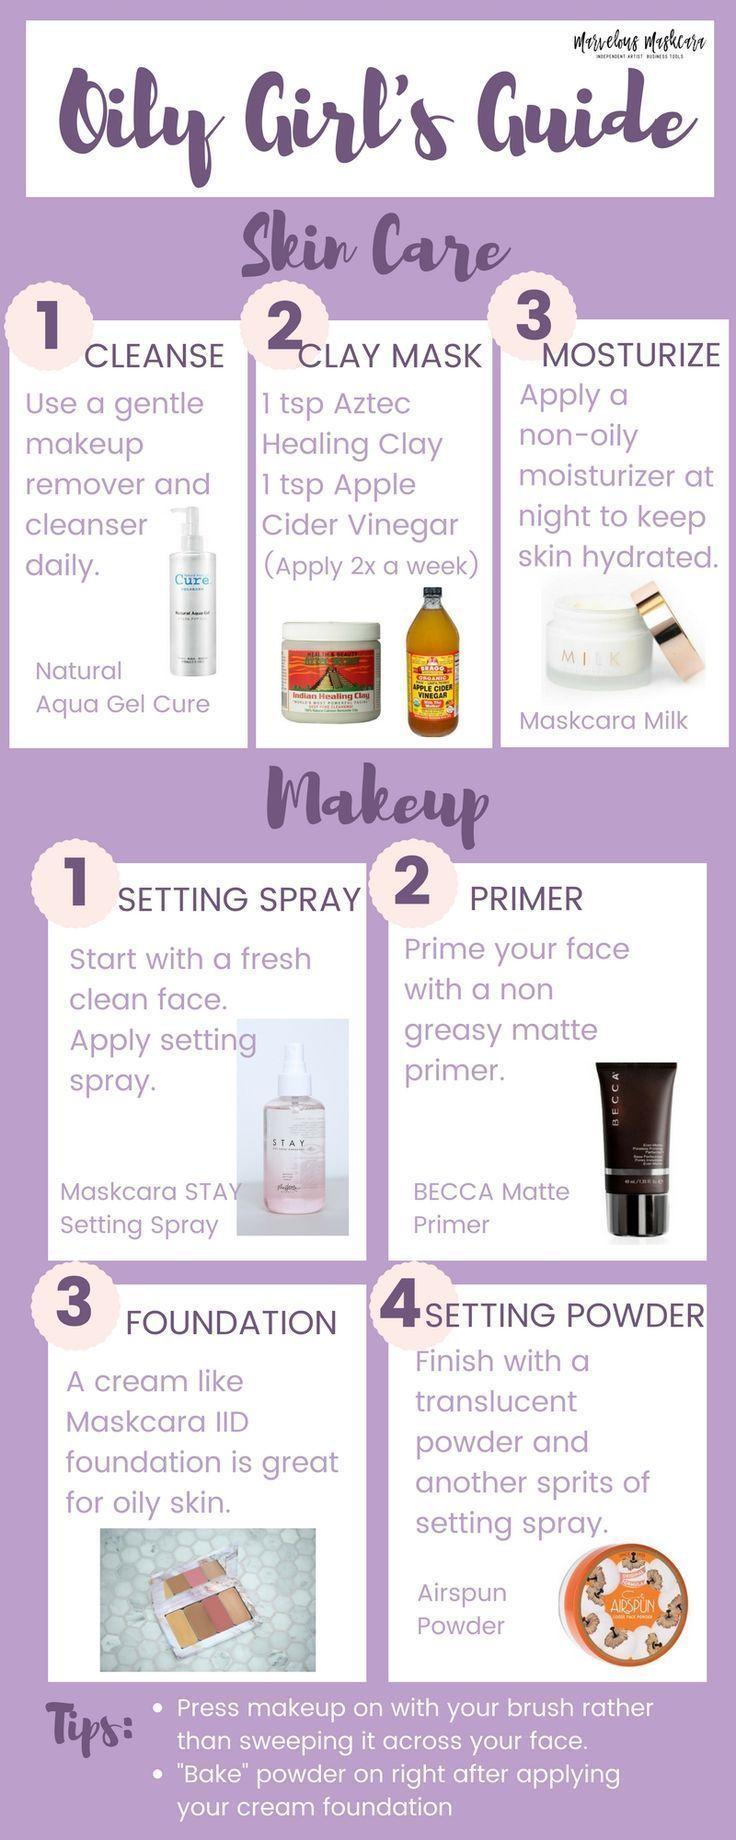 Simple And Modern Tricks Korean Skin Care Routine Anti Aging Serum Drugstore Korean Skin Care Mois Oily Skin Care Routine Oily Skin Care Skin Care Moisturizer